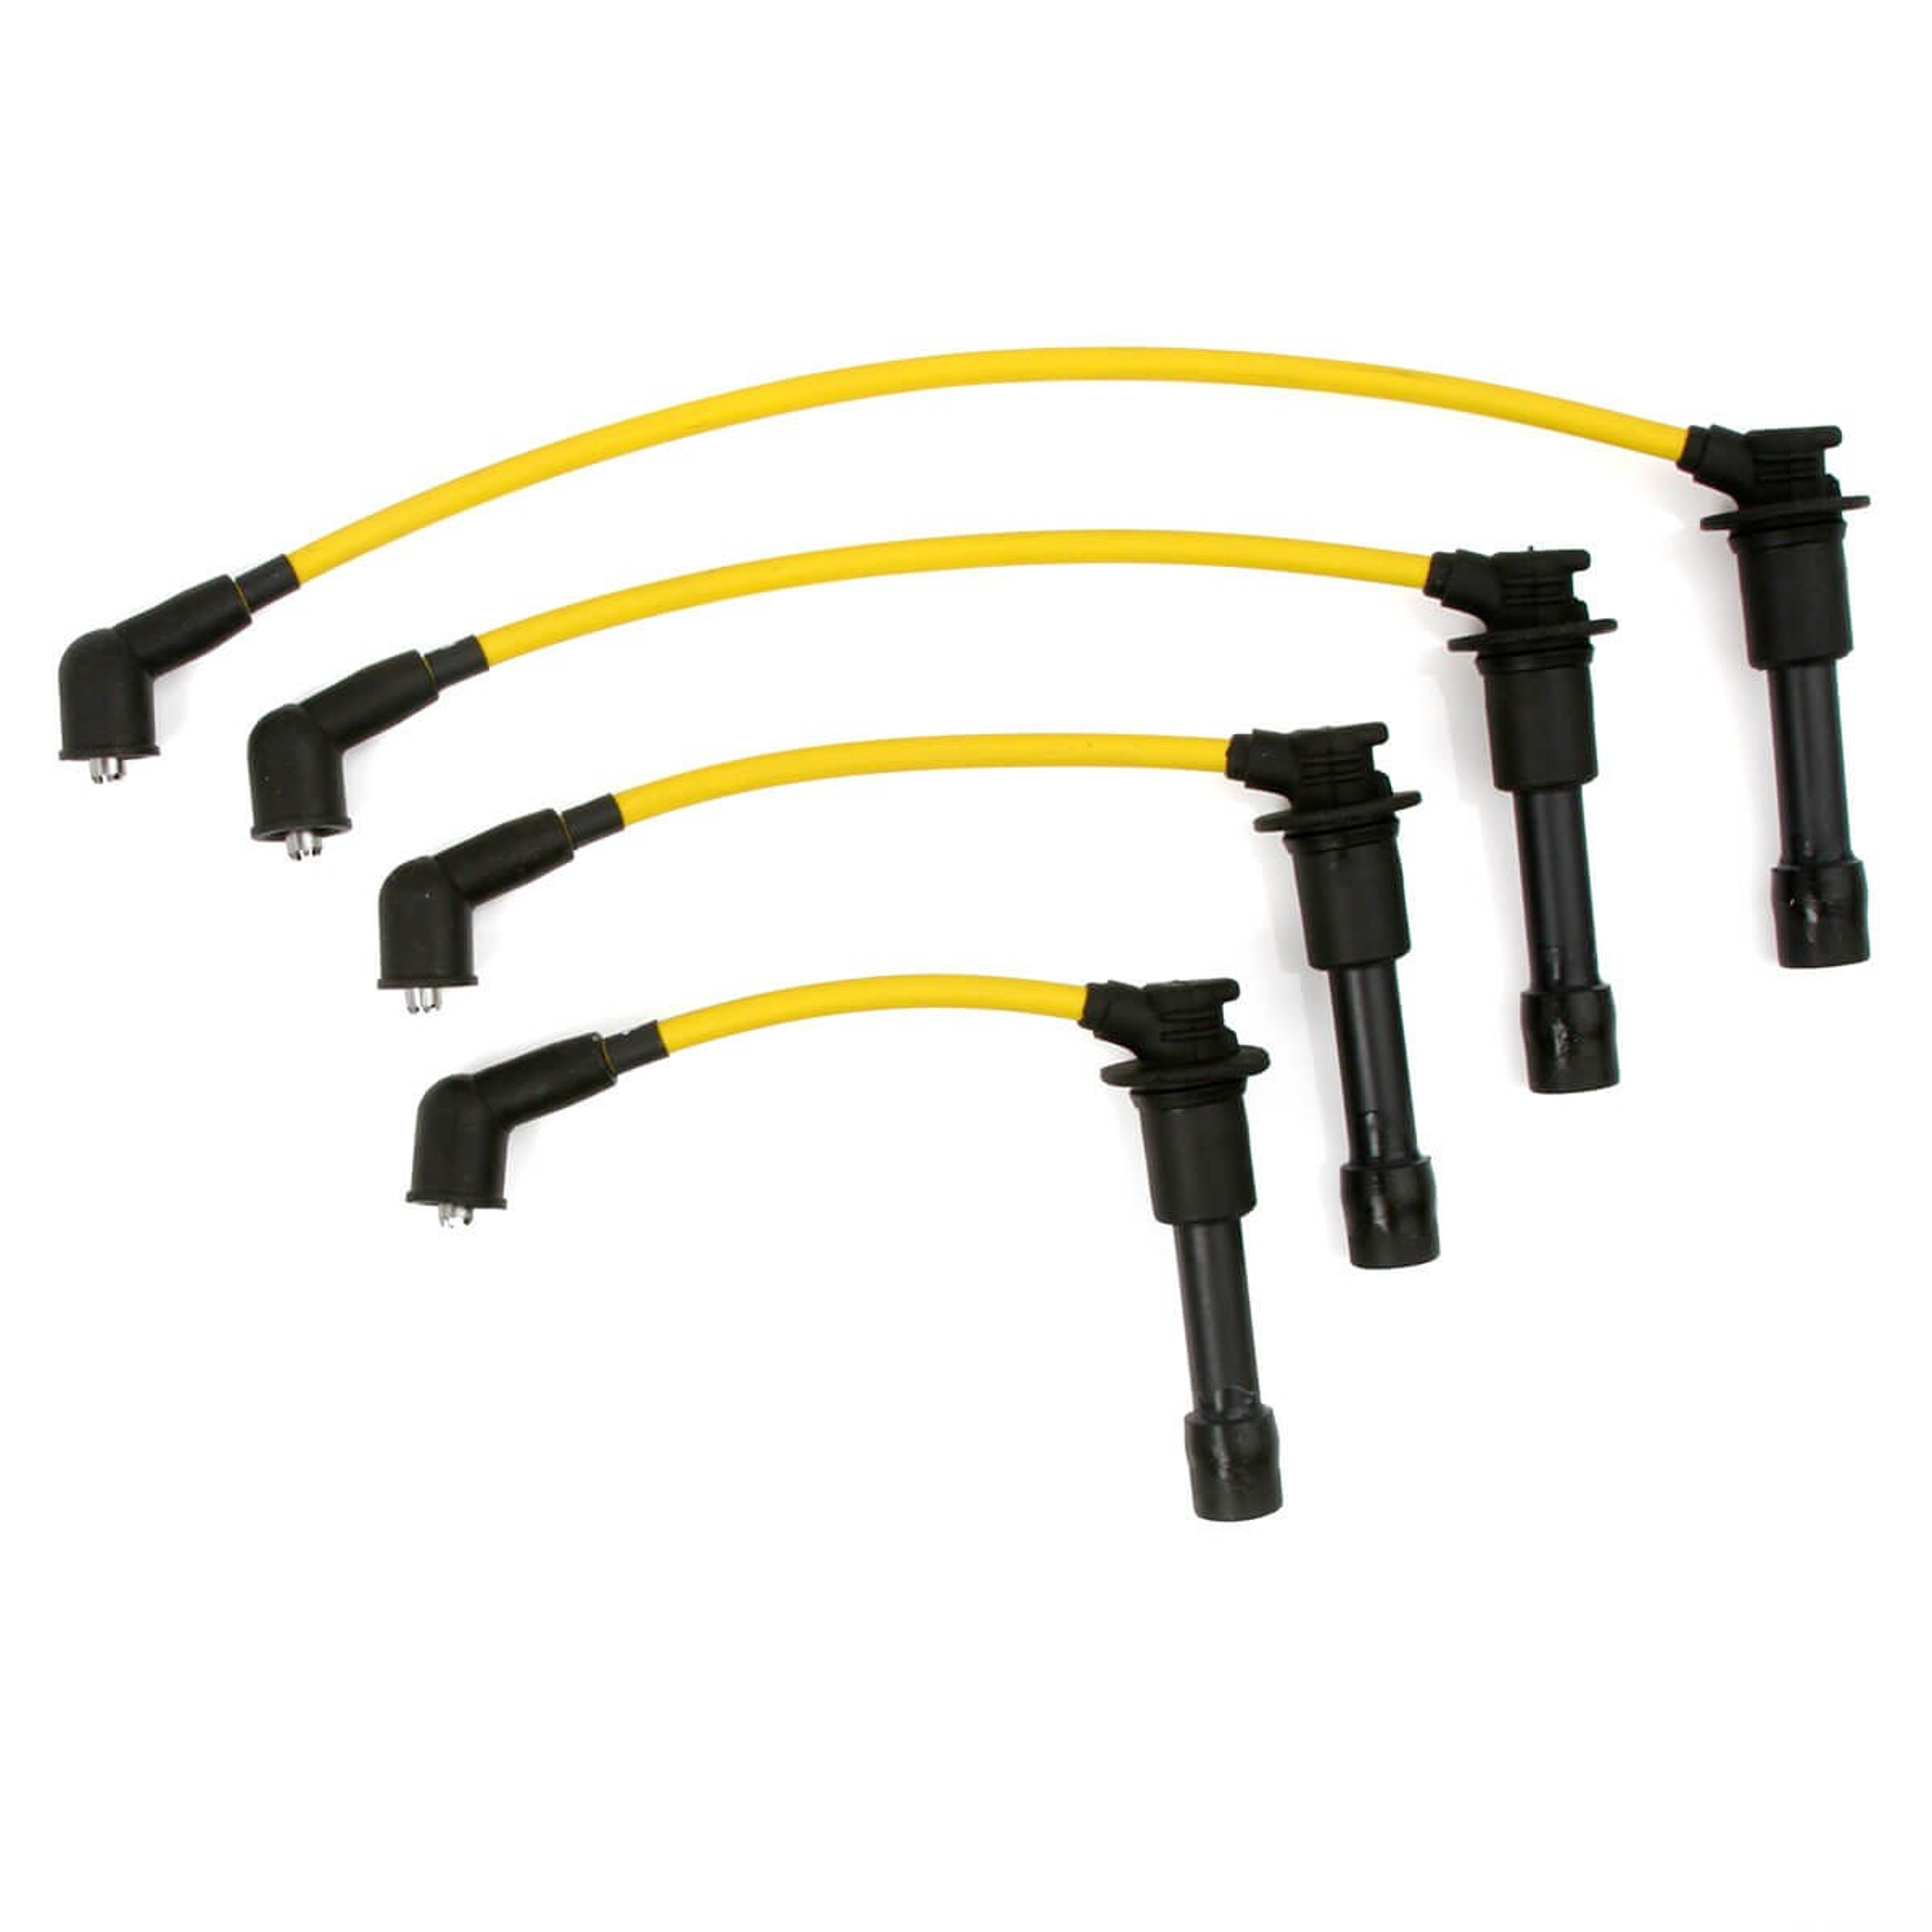 Colored Spark Plug Wire Sets - Ignition - Wires, Plugs, Coils ... on miata power steering, miata antenna, miata coil pack, miata horn, miata radiator, miata starter, miata timing belt, miata oil pan, accel spark wires, miata throttle body upgrade, miata oil pump, miata motor mounts, miata egr valve, miata intake manifold, miata wiring harness, miata straight pipe, miata door handle, miata fog lights, miata fuel pressure regulator, miata fuel pump,